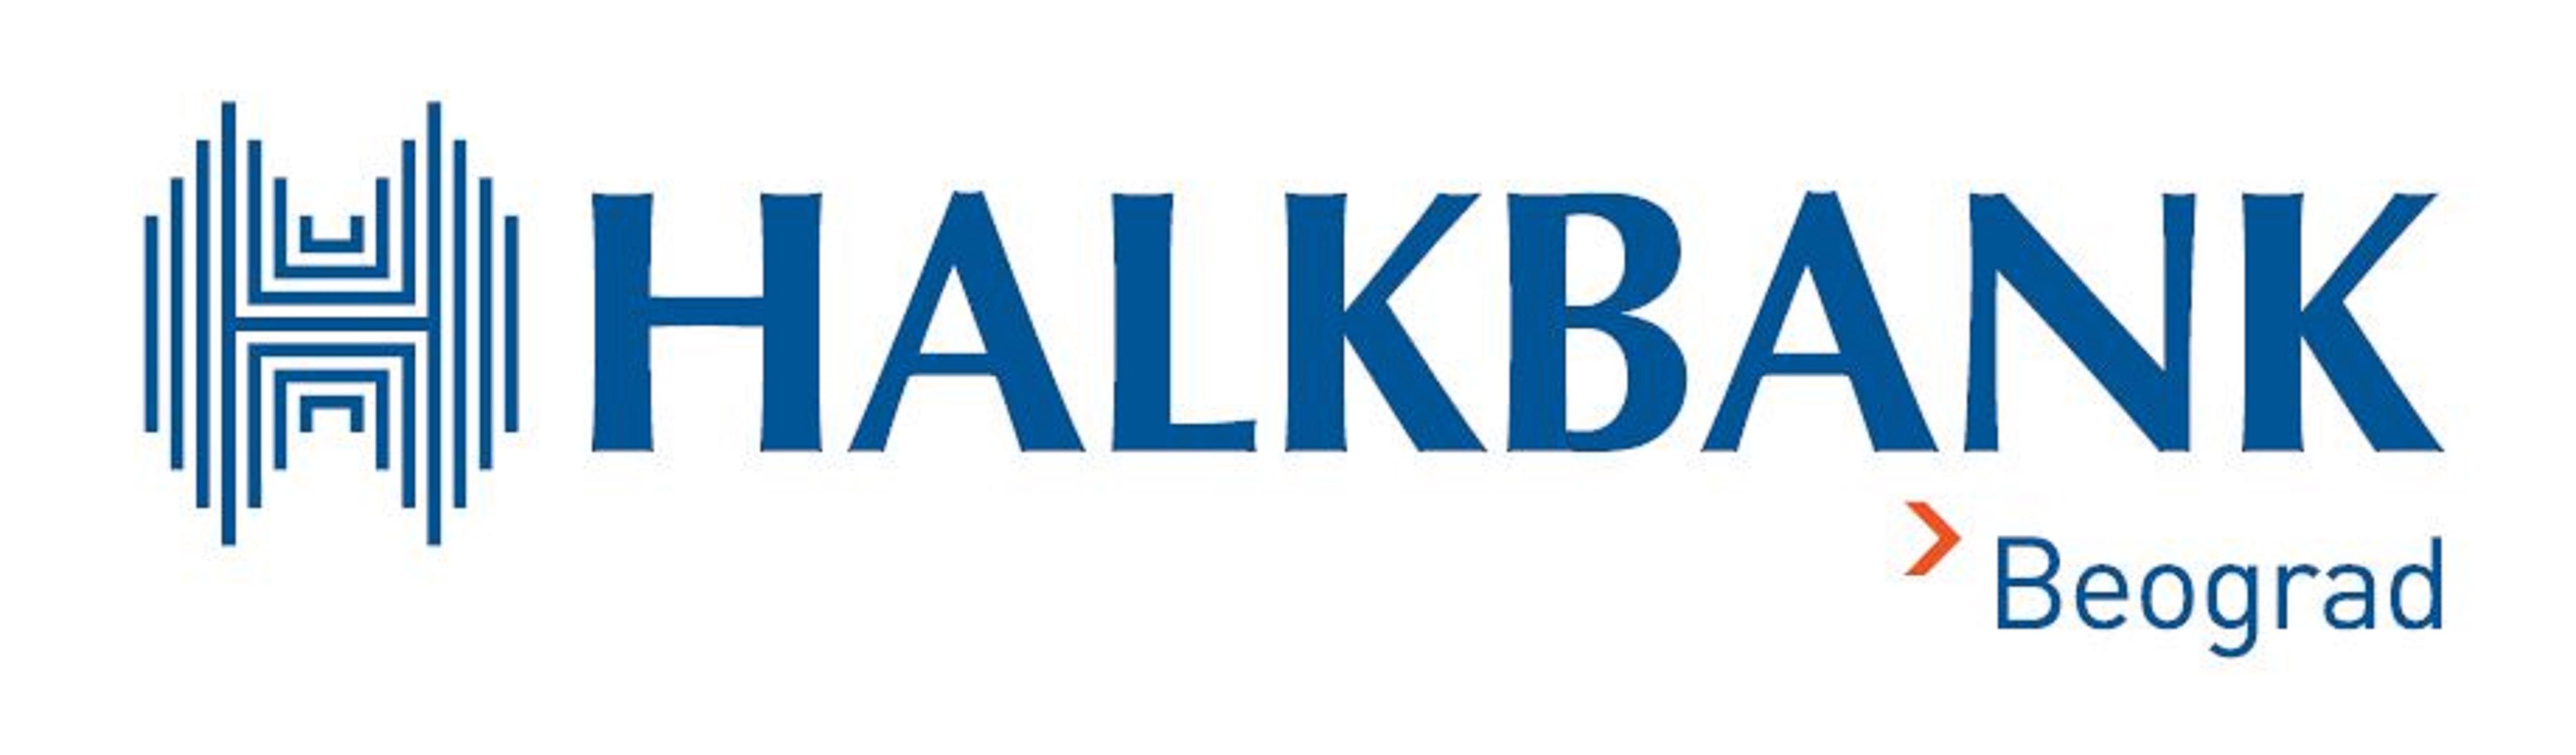 HALKBANK a.d. Beograd